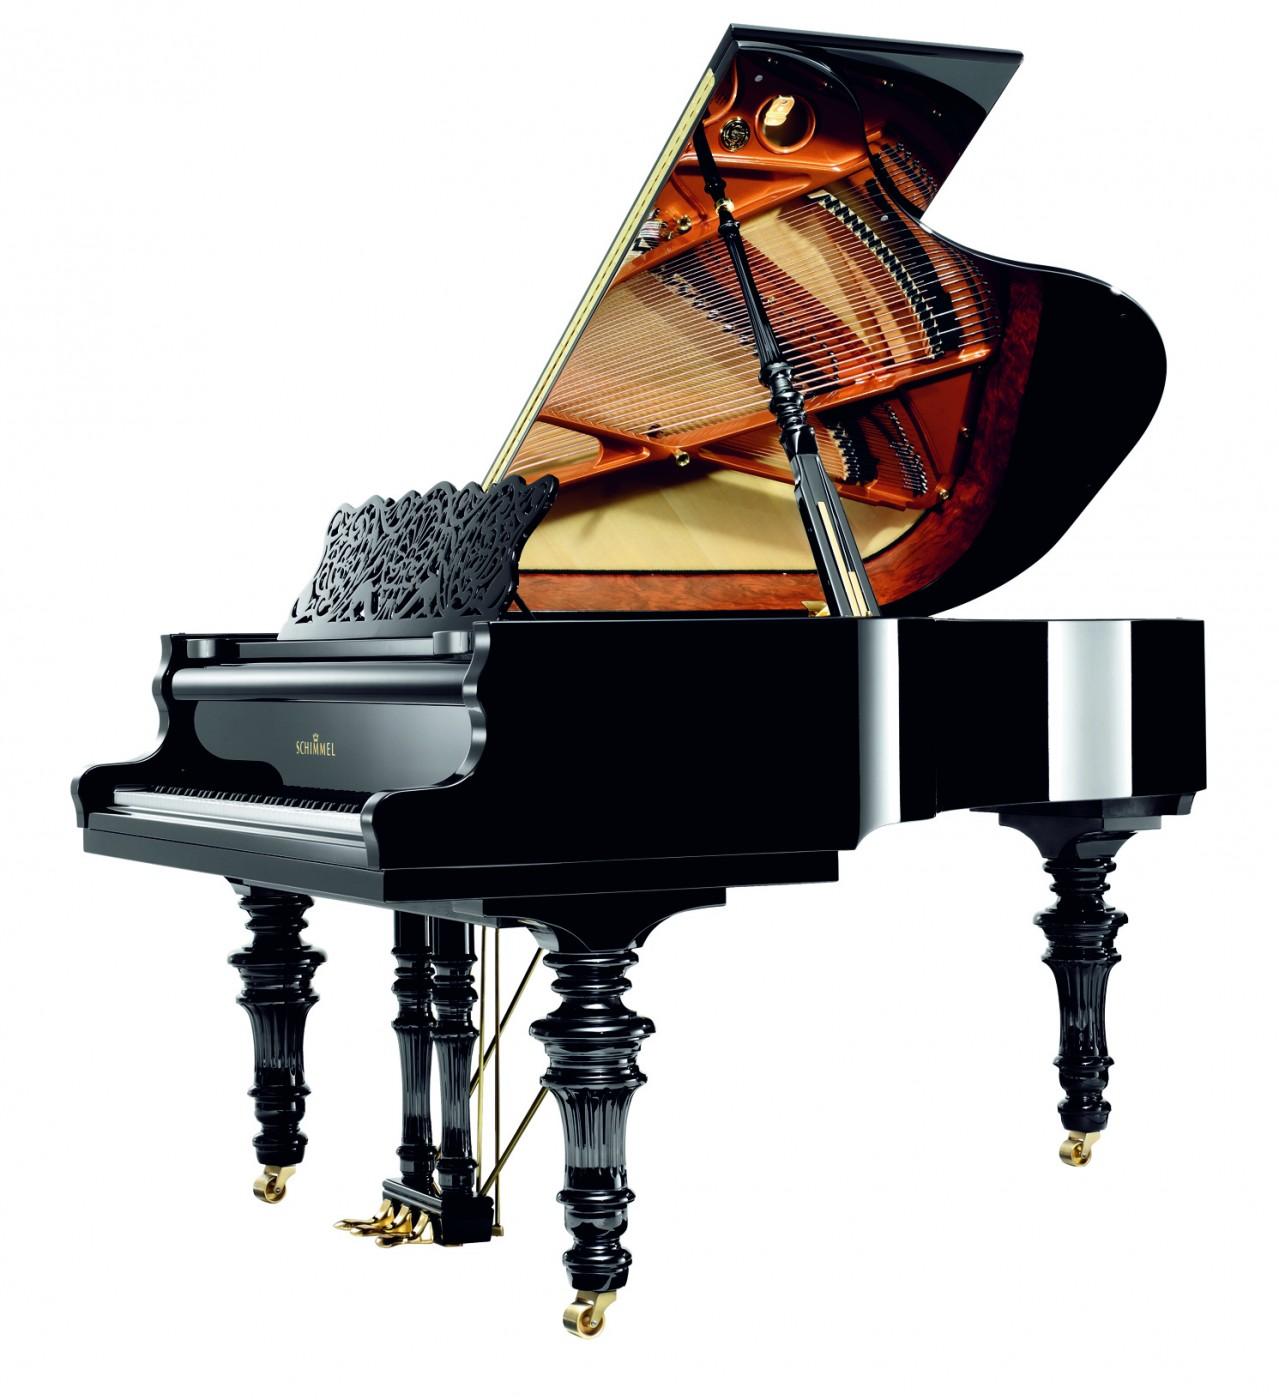 Grand Pianos, Baby Grand Pianos, Piano Store | Roger's Piano